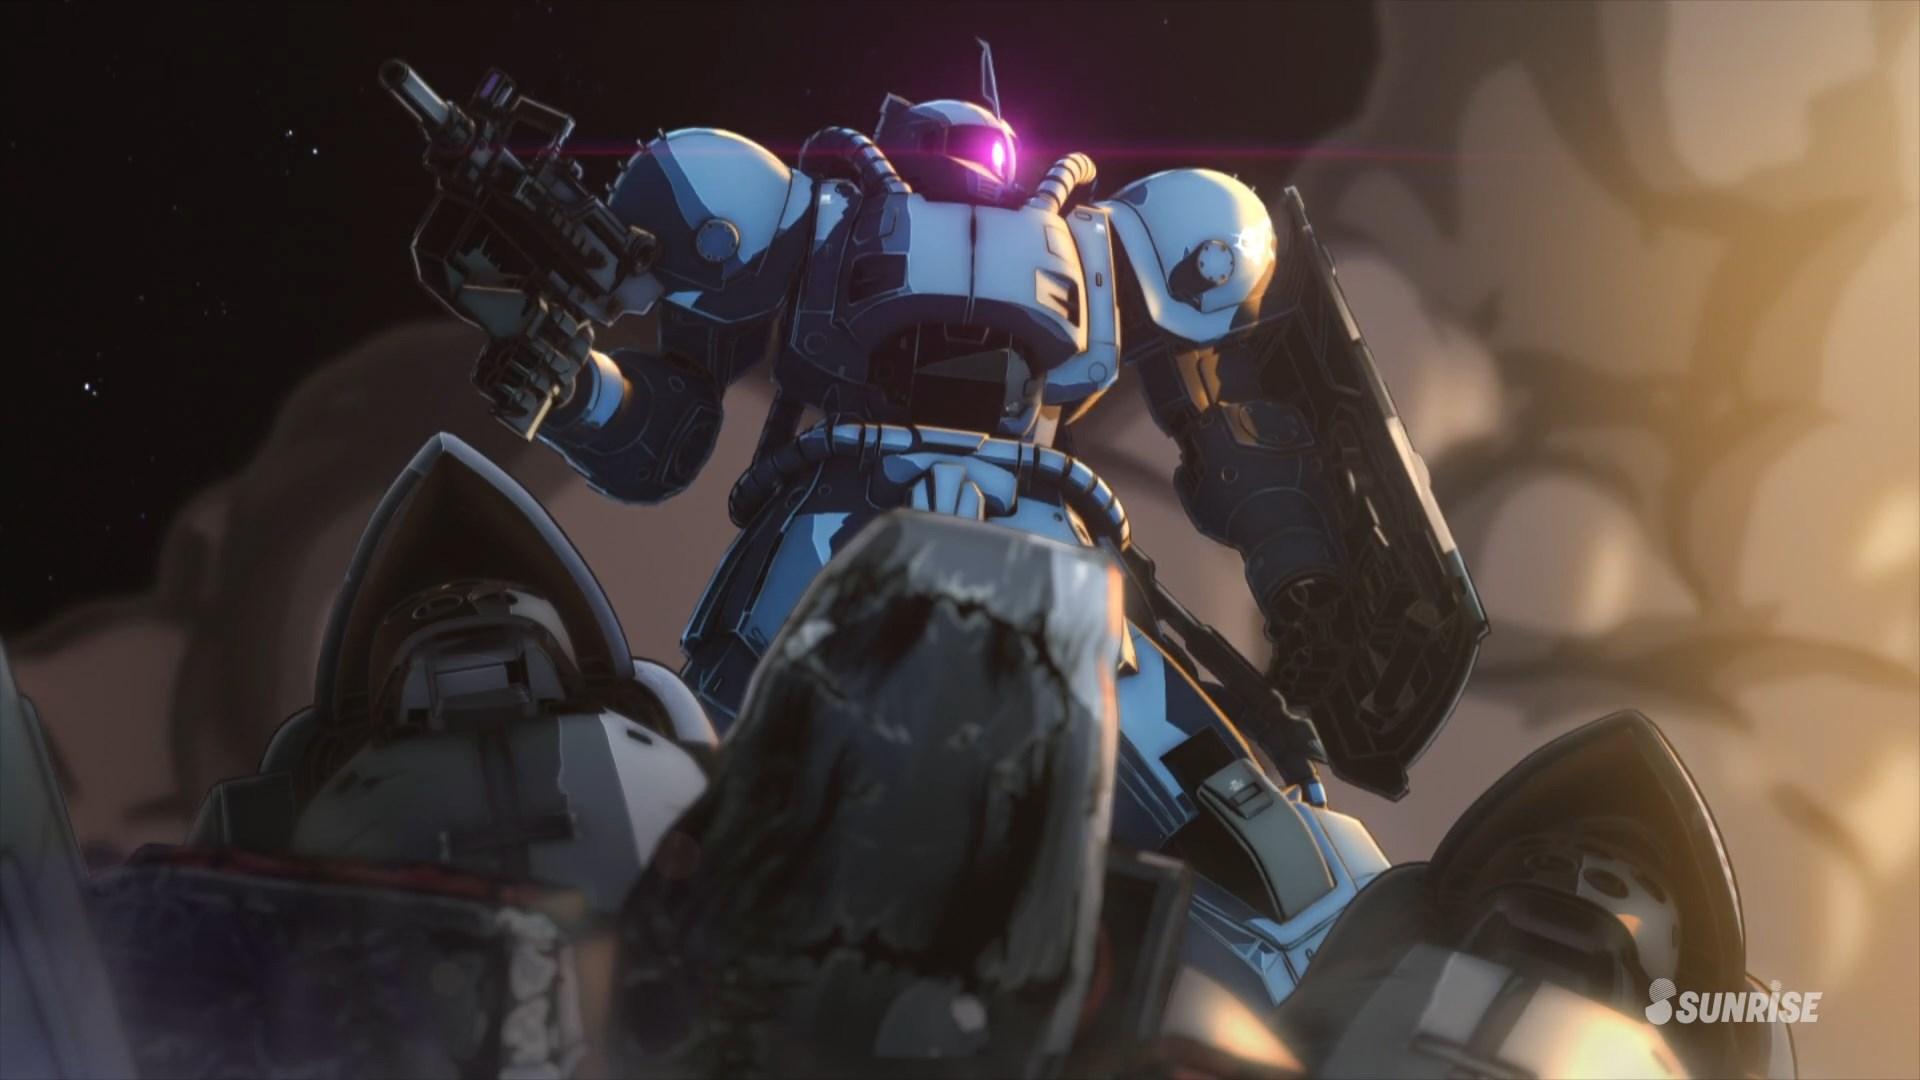 Gundam Girl Wallpaper Mobile Suit Gundam The Origin 04 Now With More Action